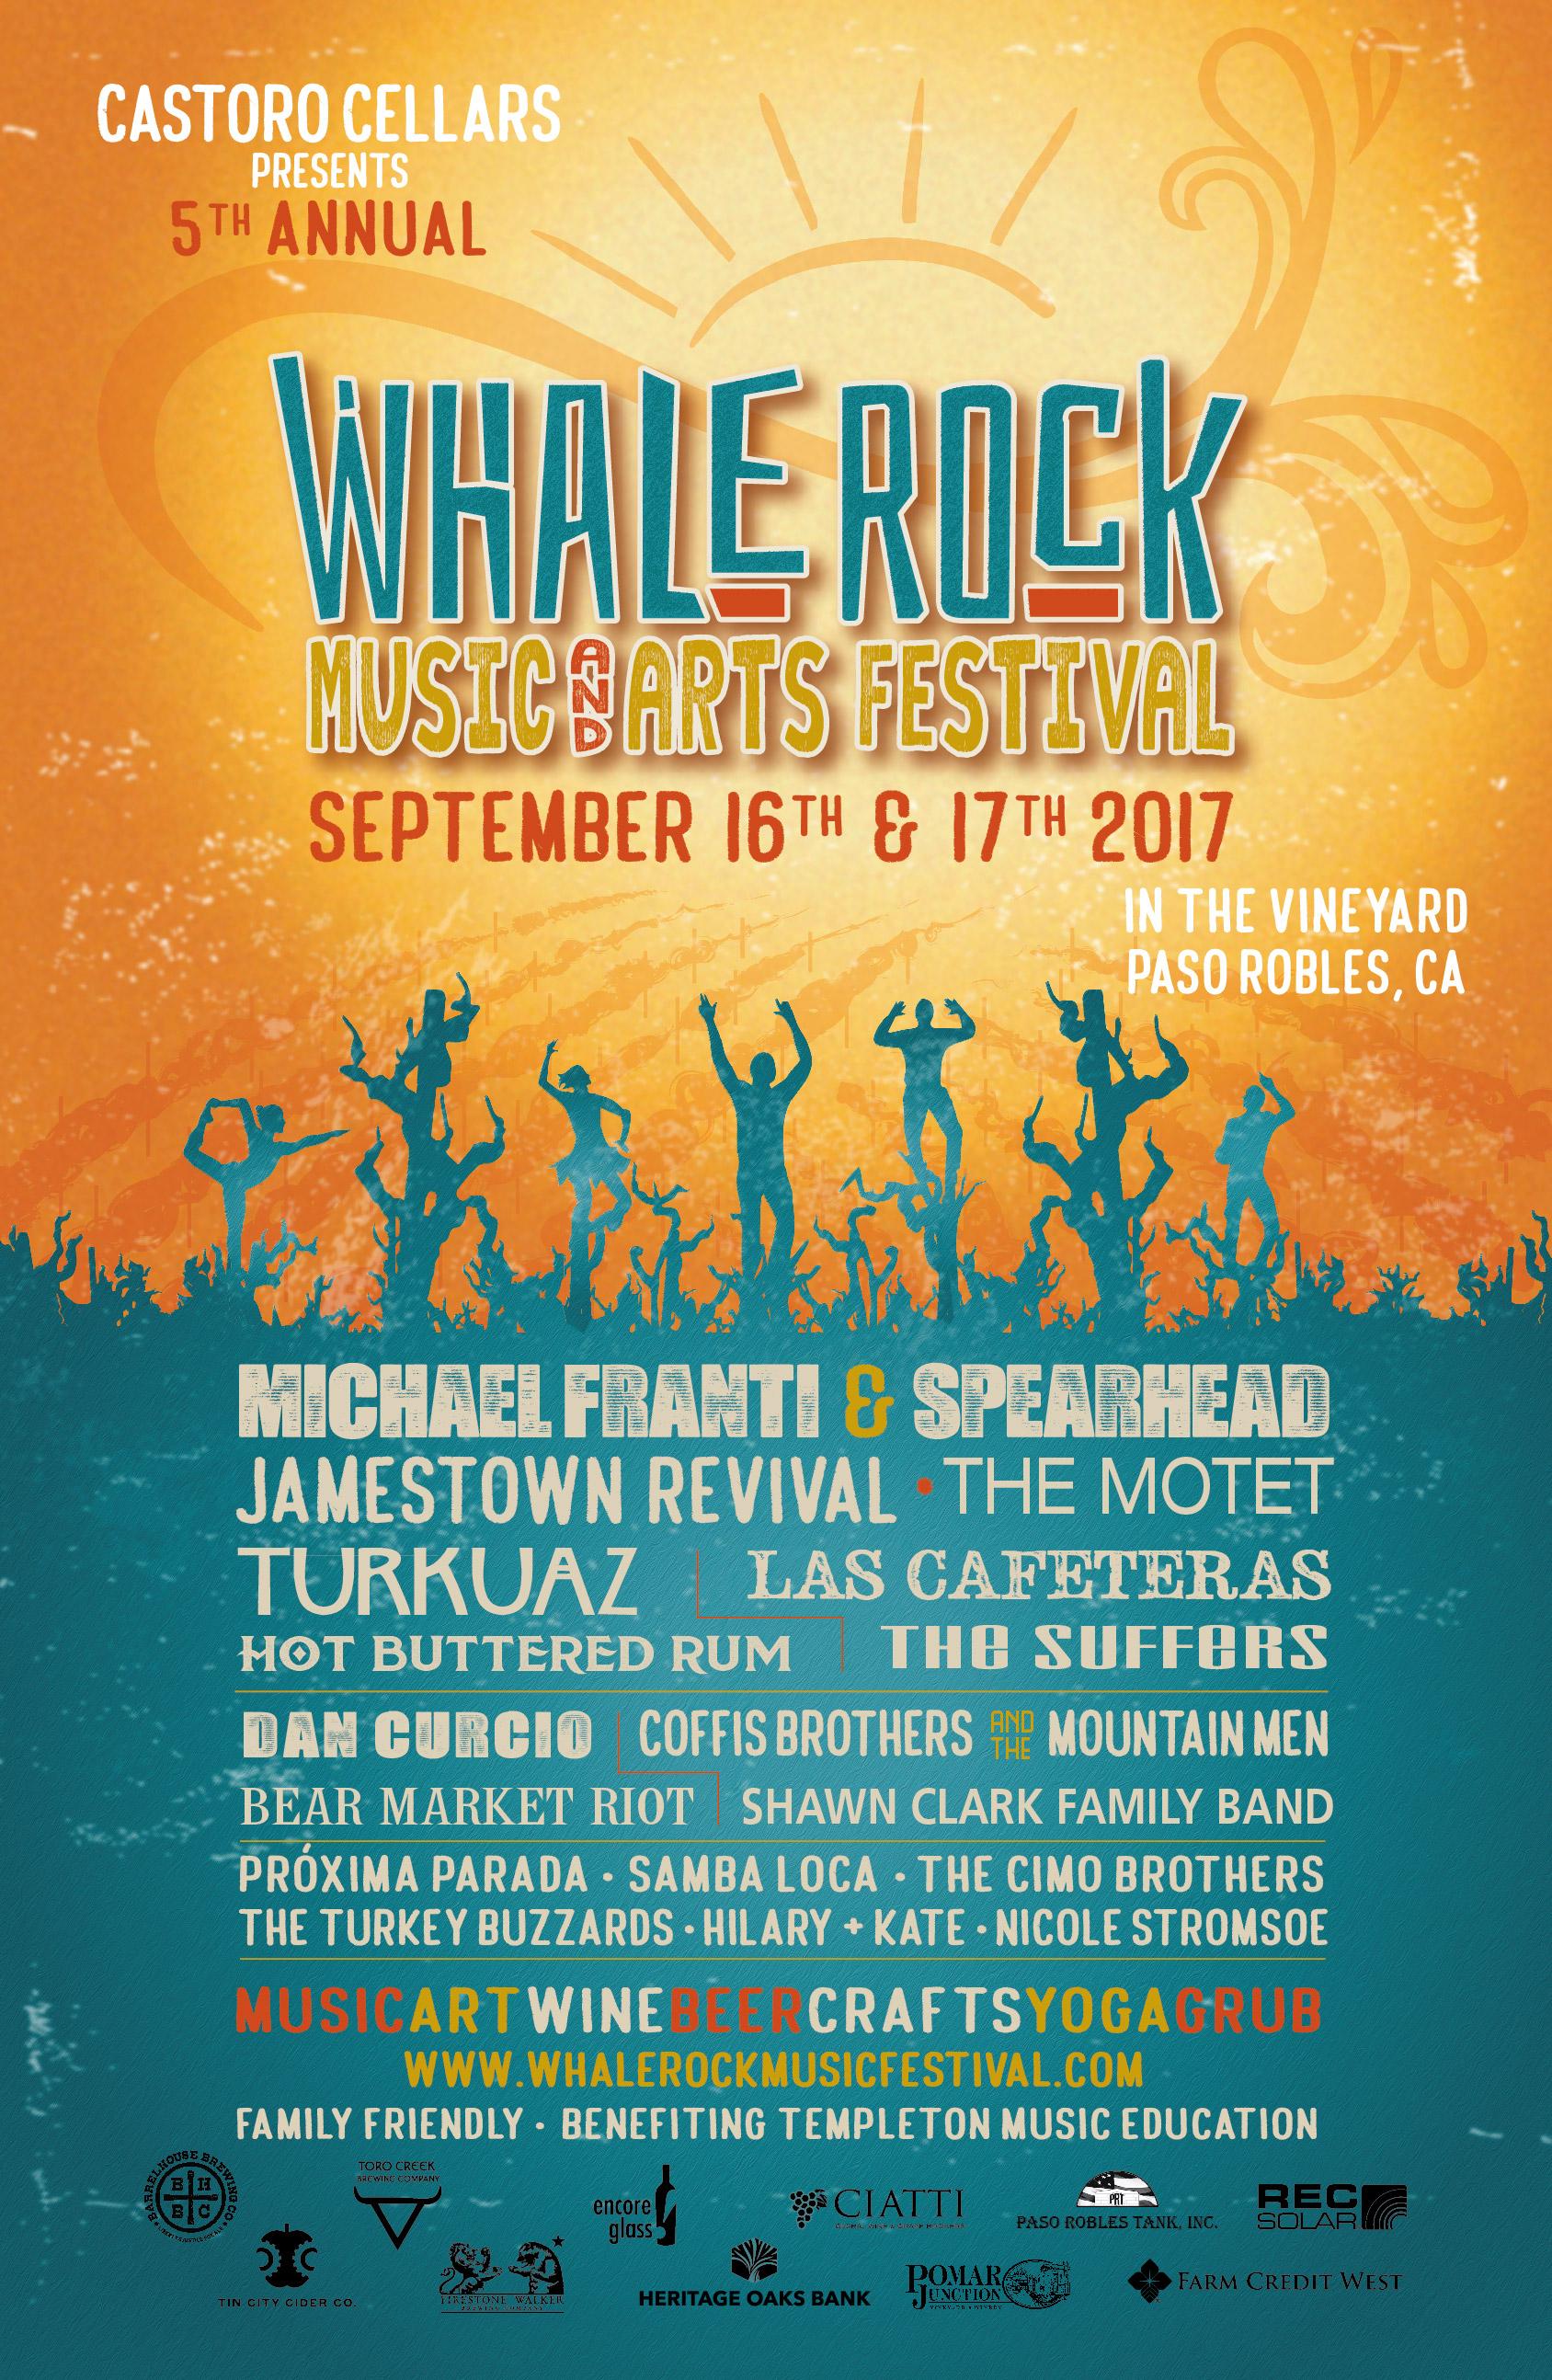 Whale Rock 2017 11x17 Poster Final-01.jpg